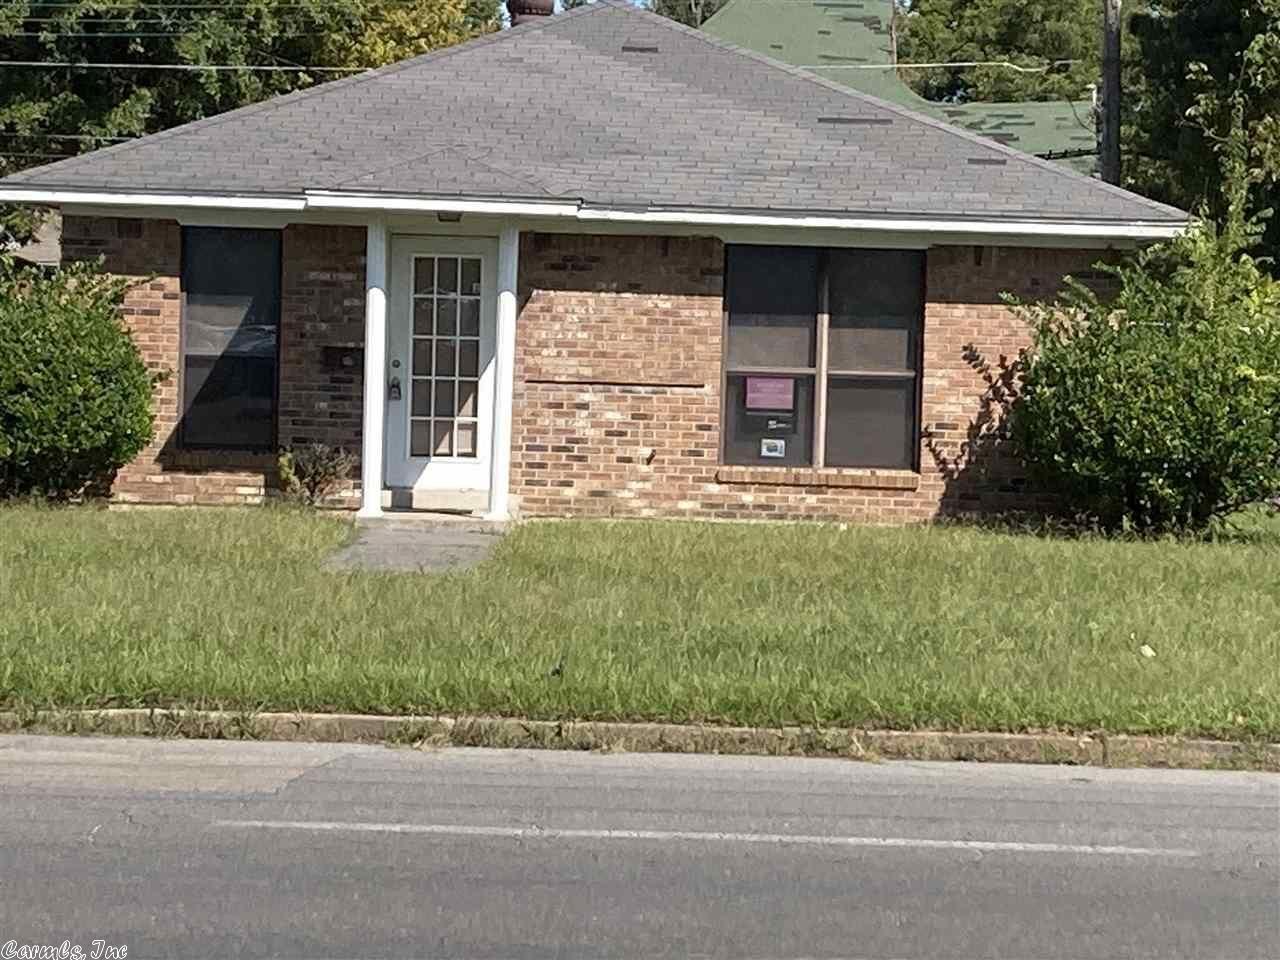 Photo for 1219 W 6th, Pine Bluff, AR 71603 (MLS # 20031484)